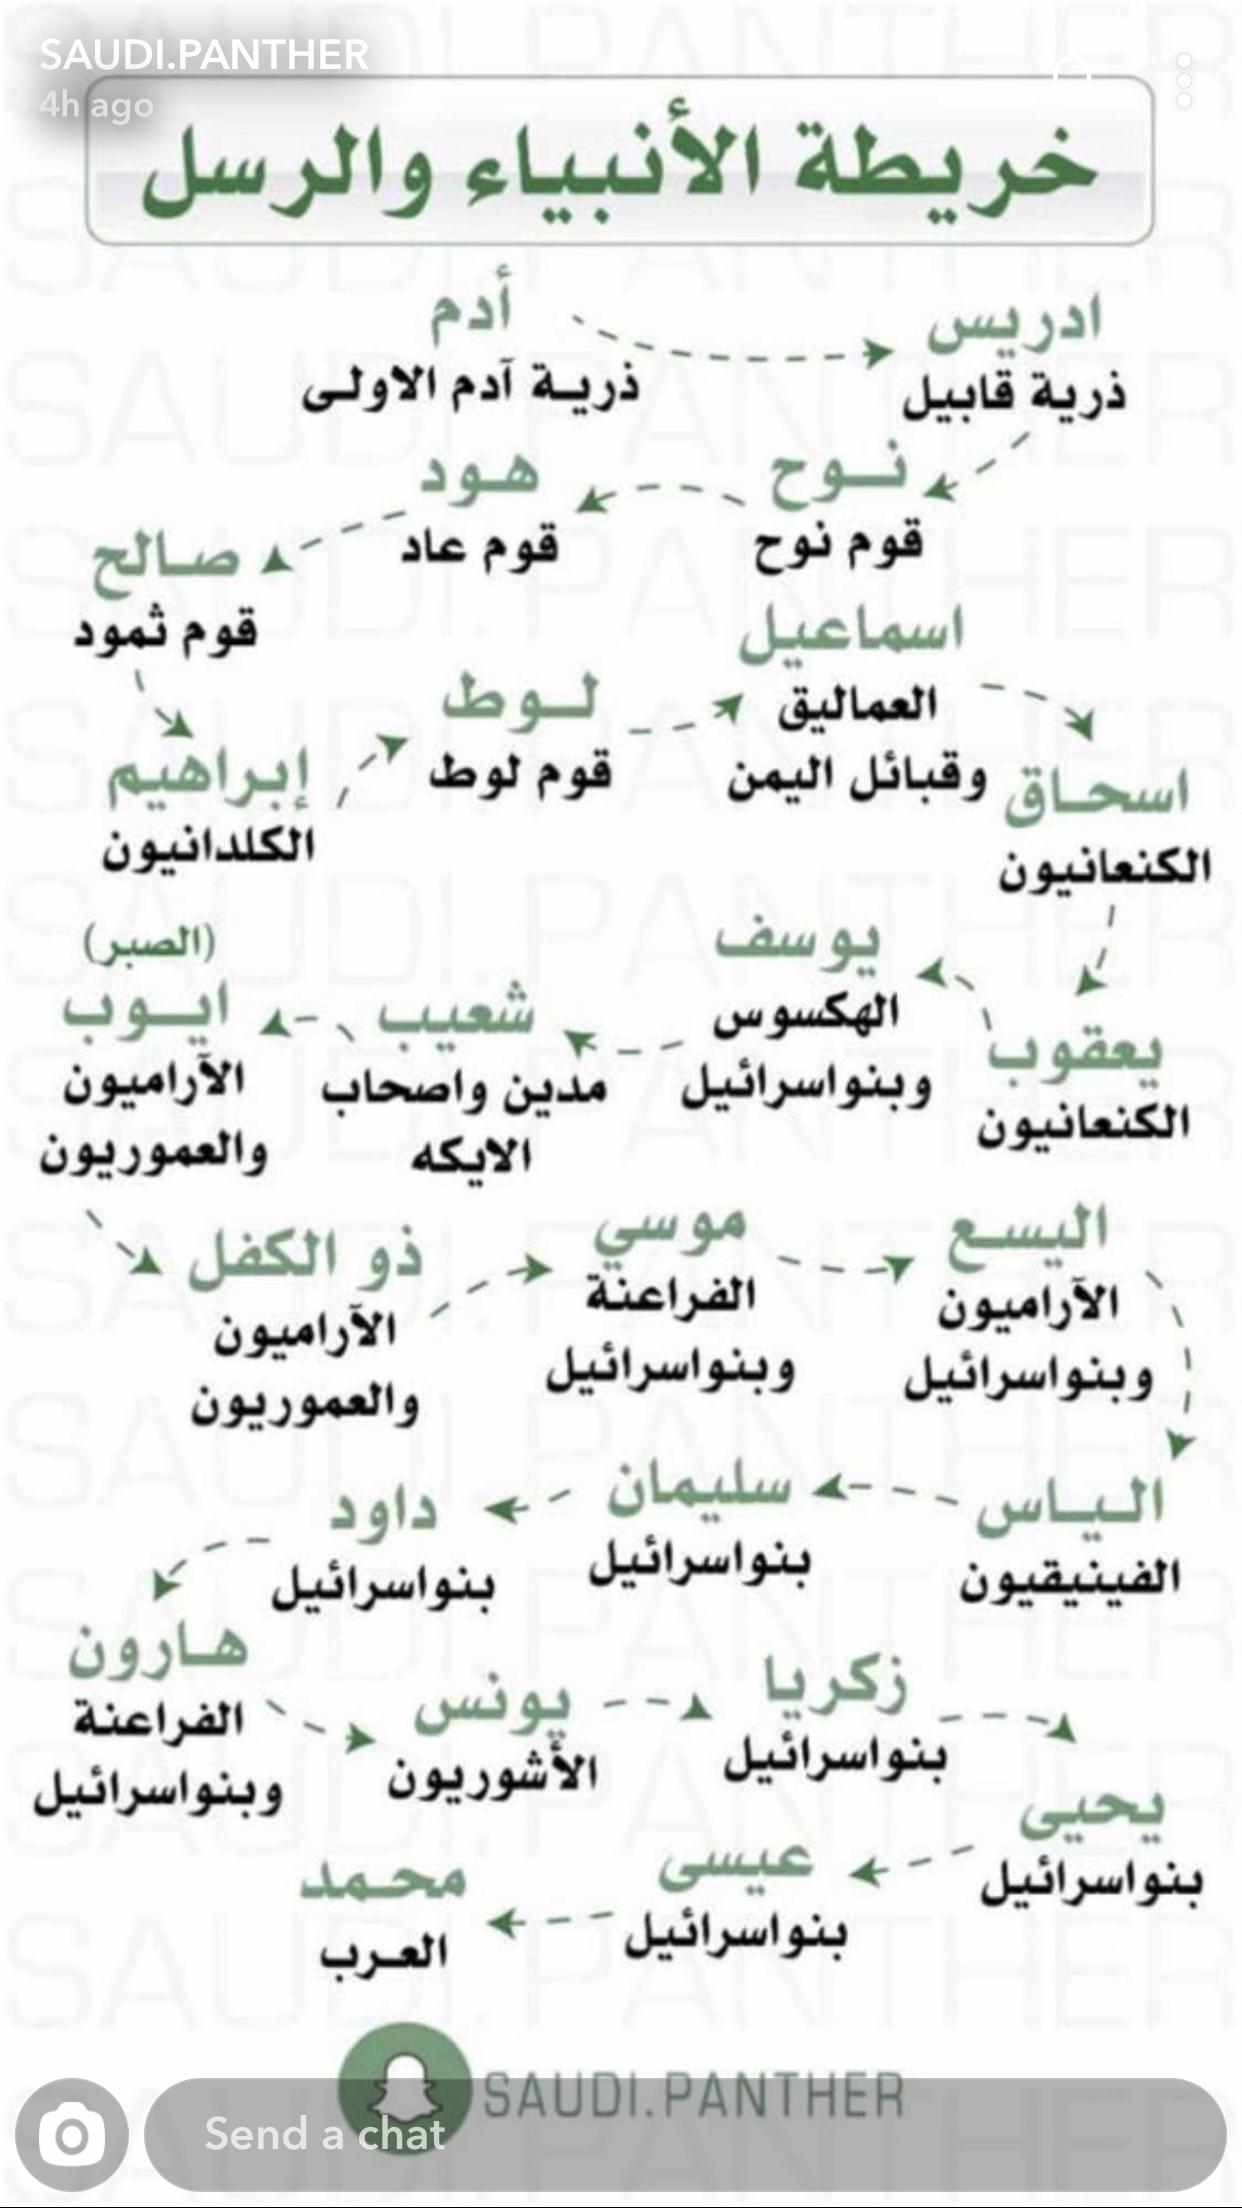 Pin By Ali Ali Mala On Saudi Panther In 2020 Islamic Phrases Islamic Quotes Quran Islamic Love Quotes